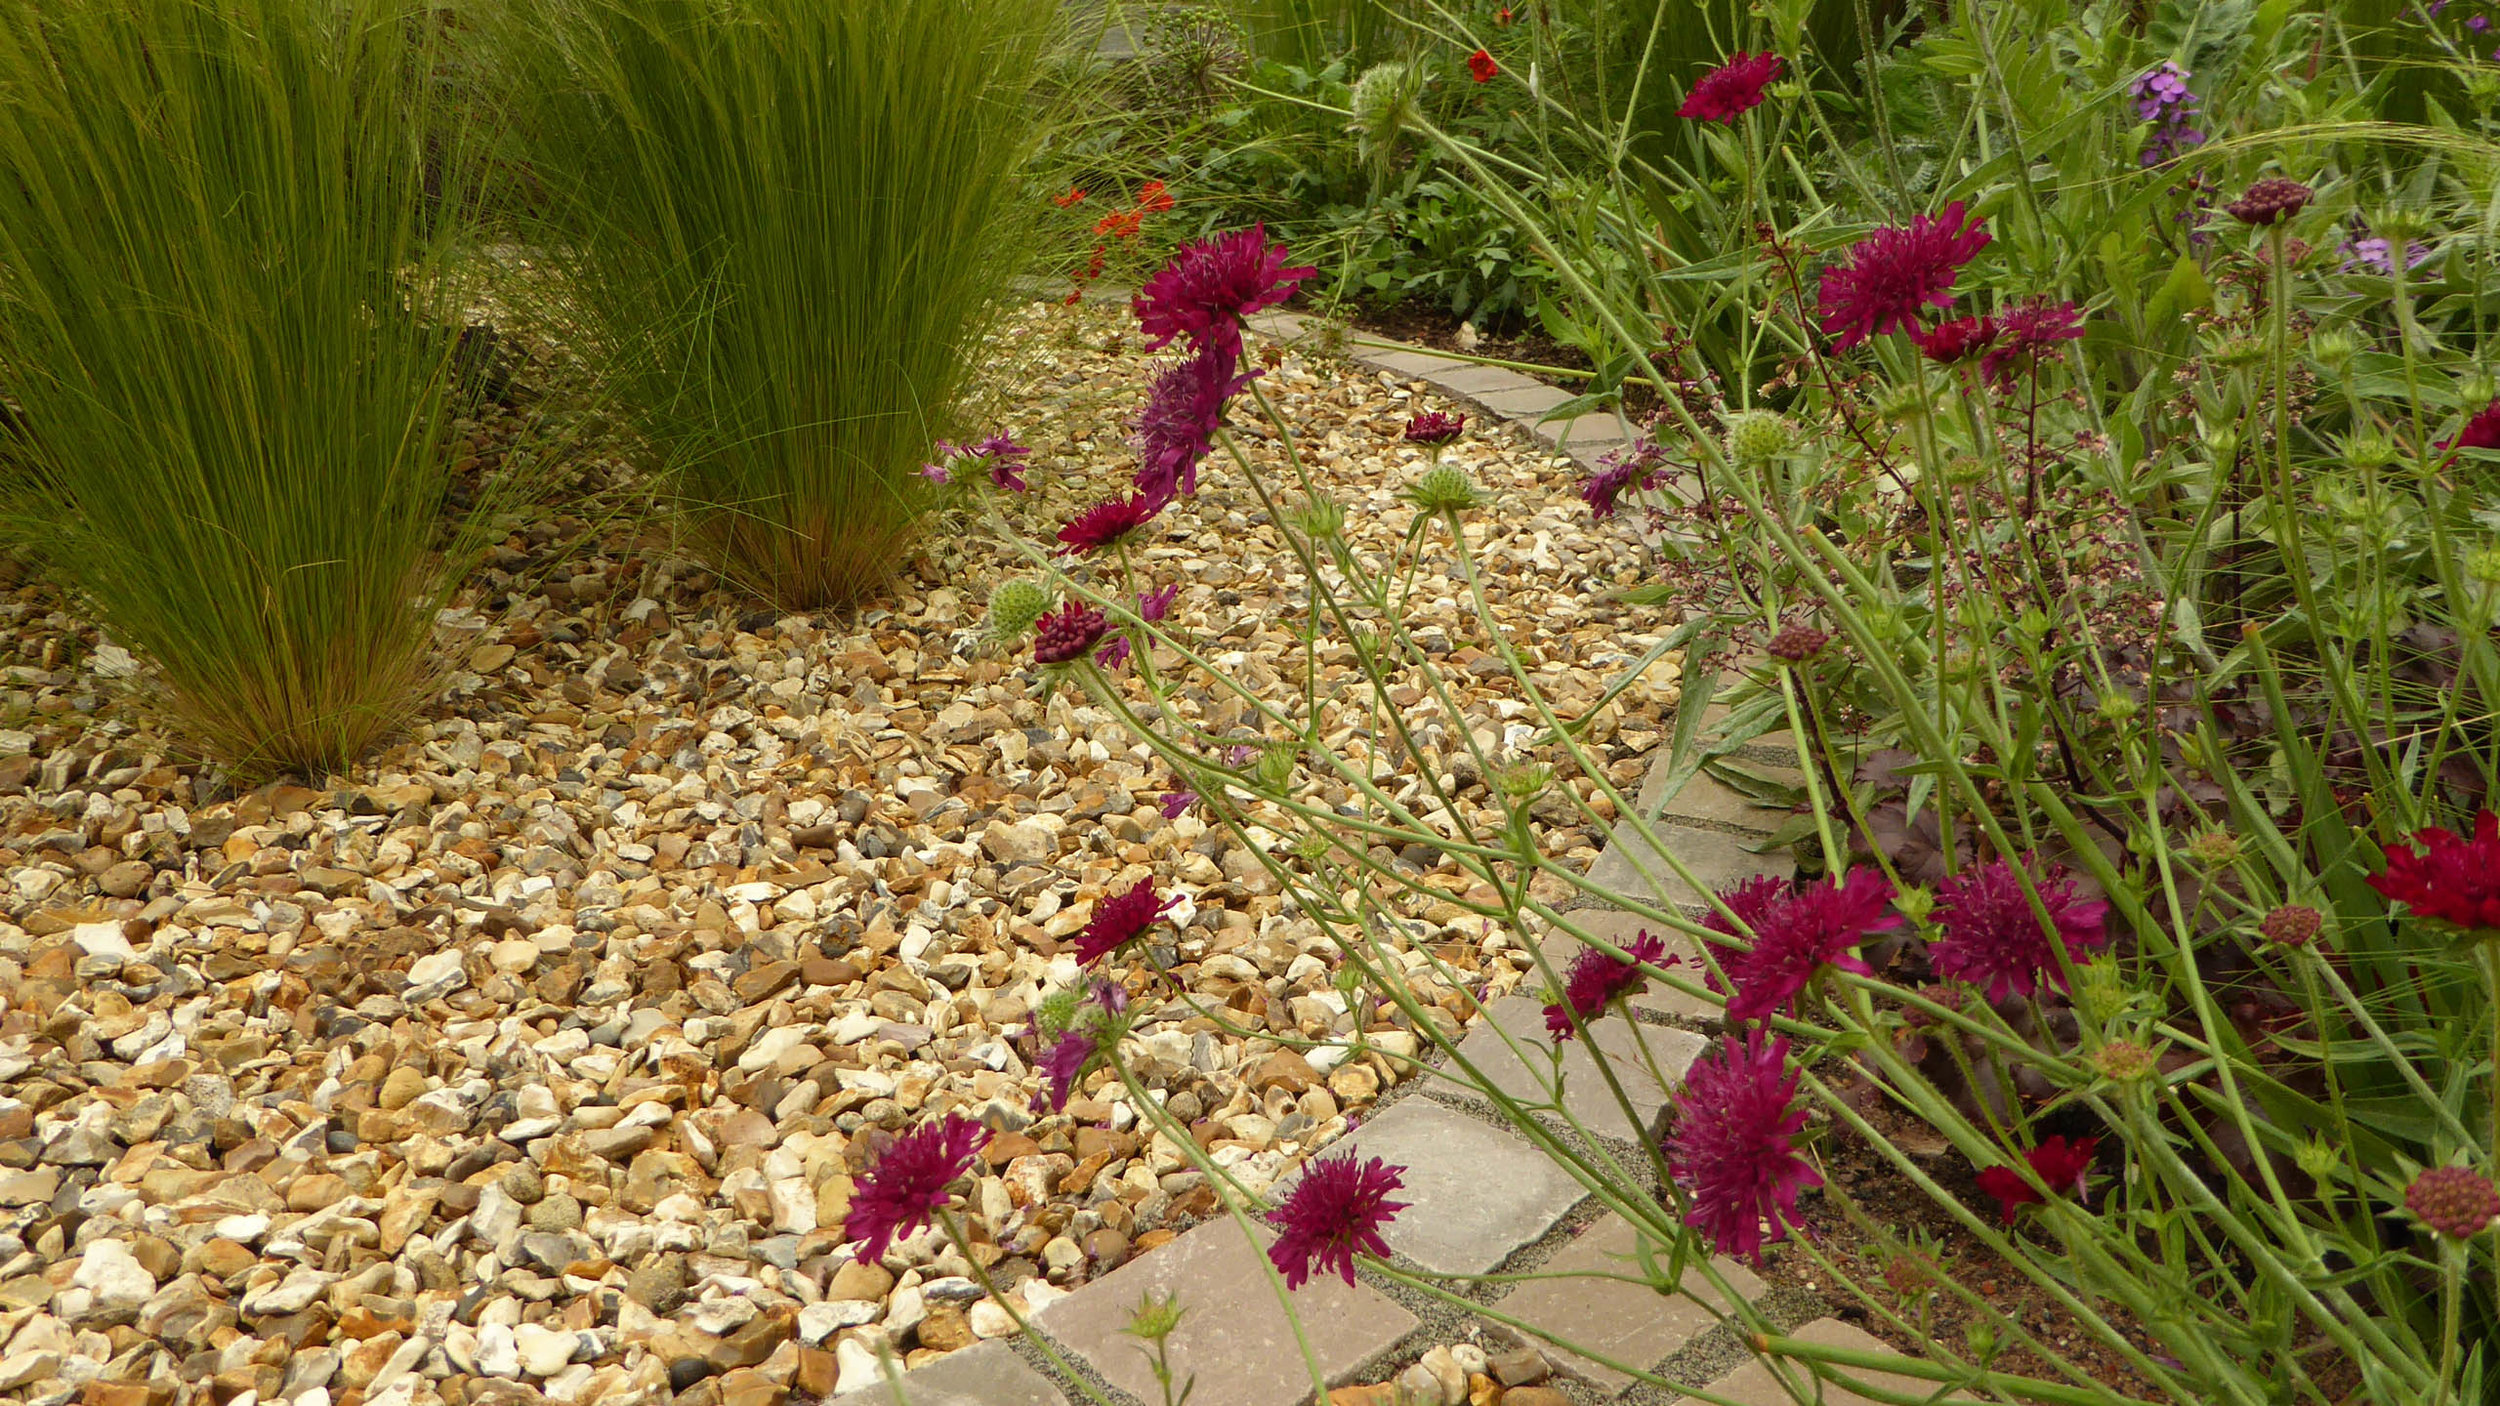 Cheshire Garden Design: Interlocking Curves and Acer (Front Garden) Grasses and Gravel